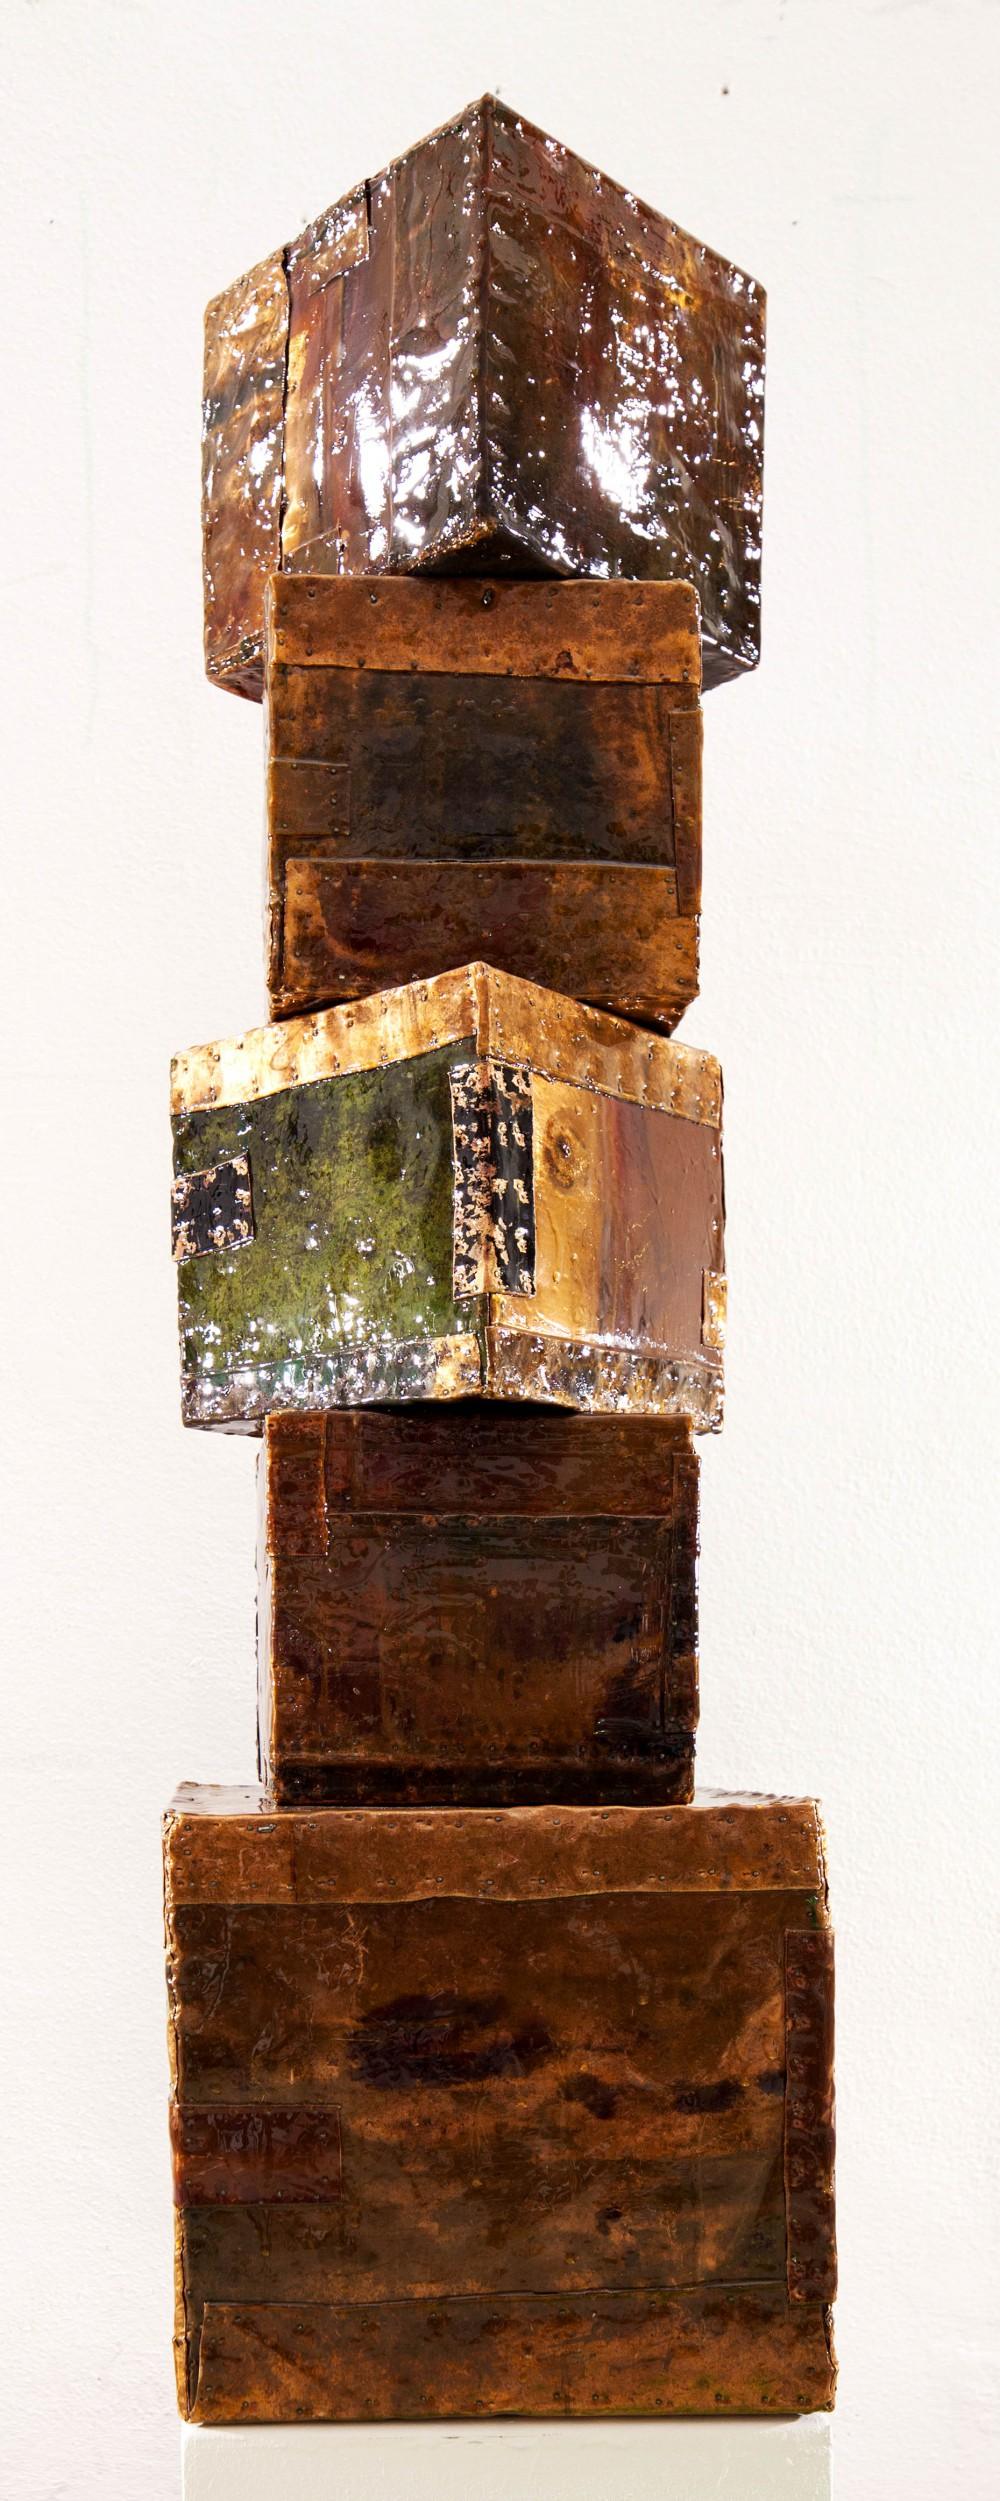 Cubetower, 2014, 112x30x30cm,, Lackiertes Kupfer